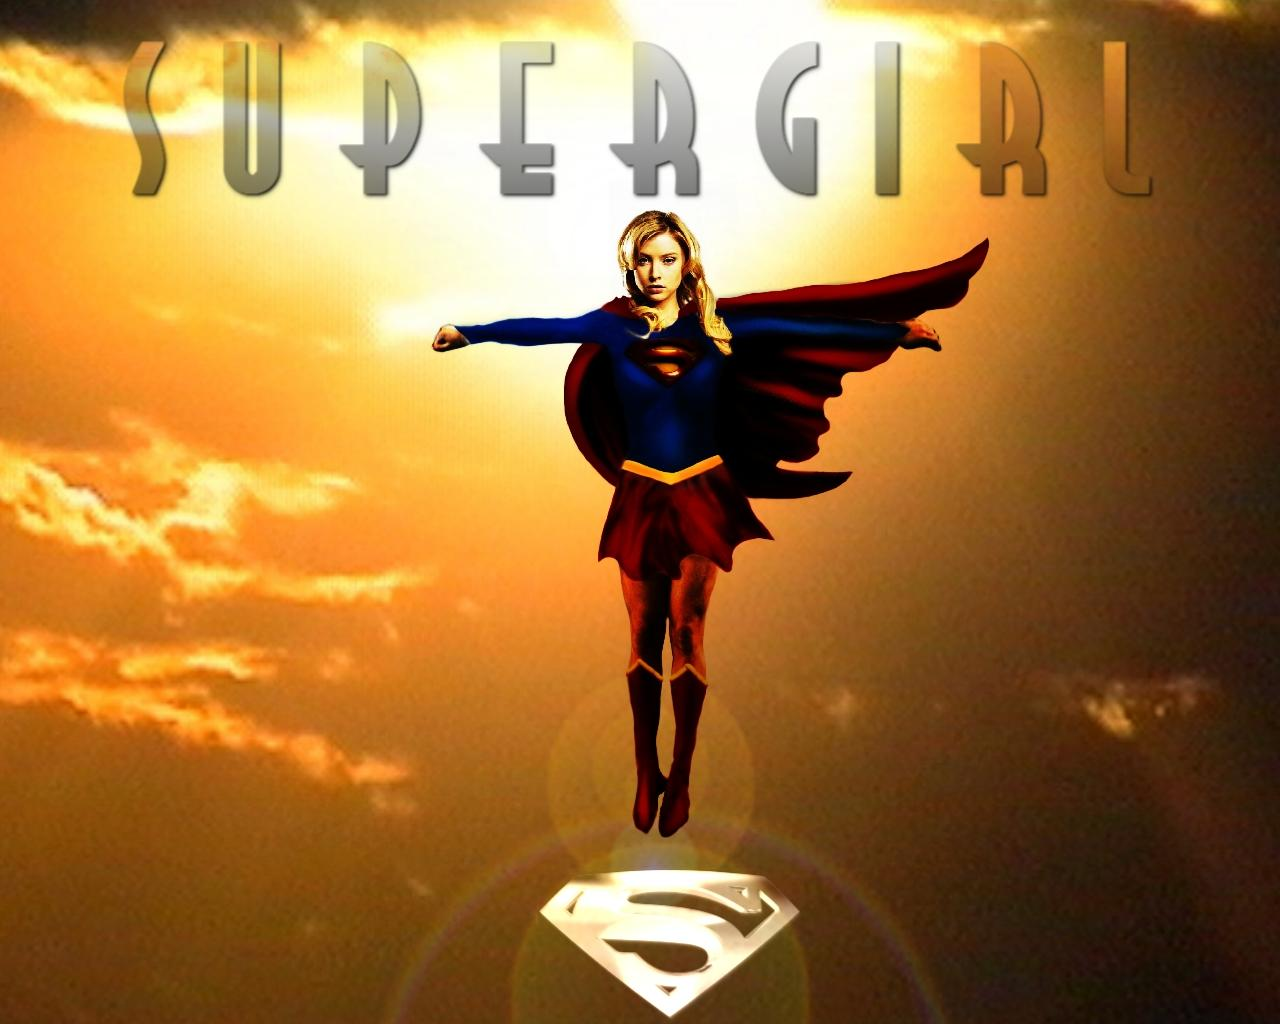 Supergirl- Sunset Flight -Movie Poster 2